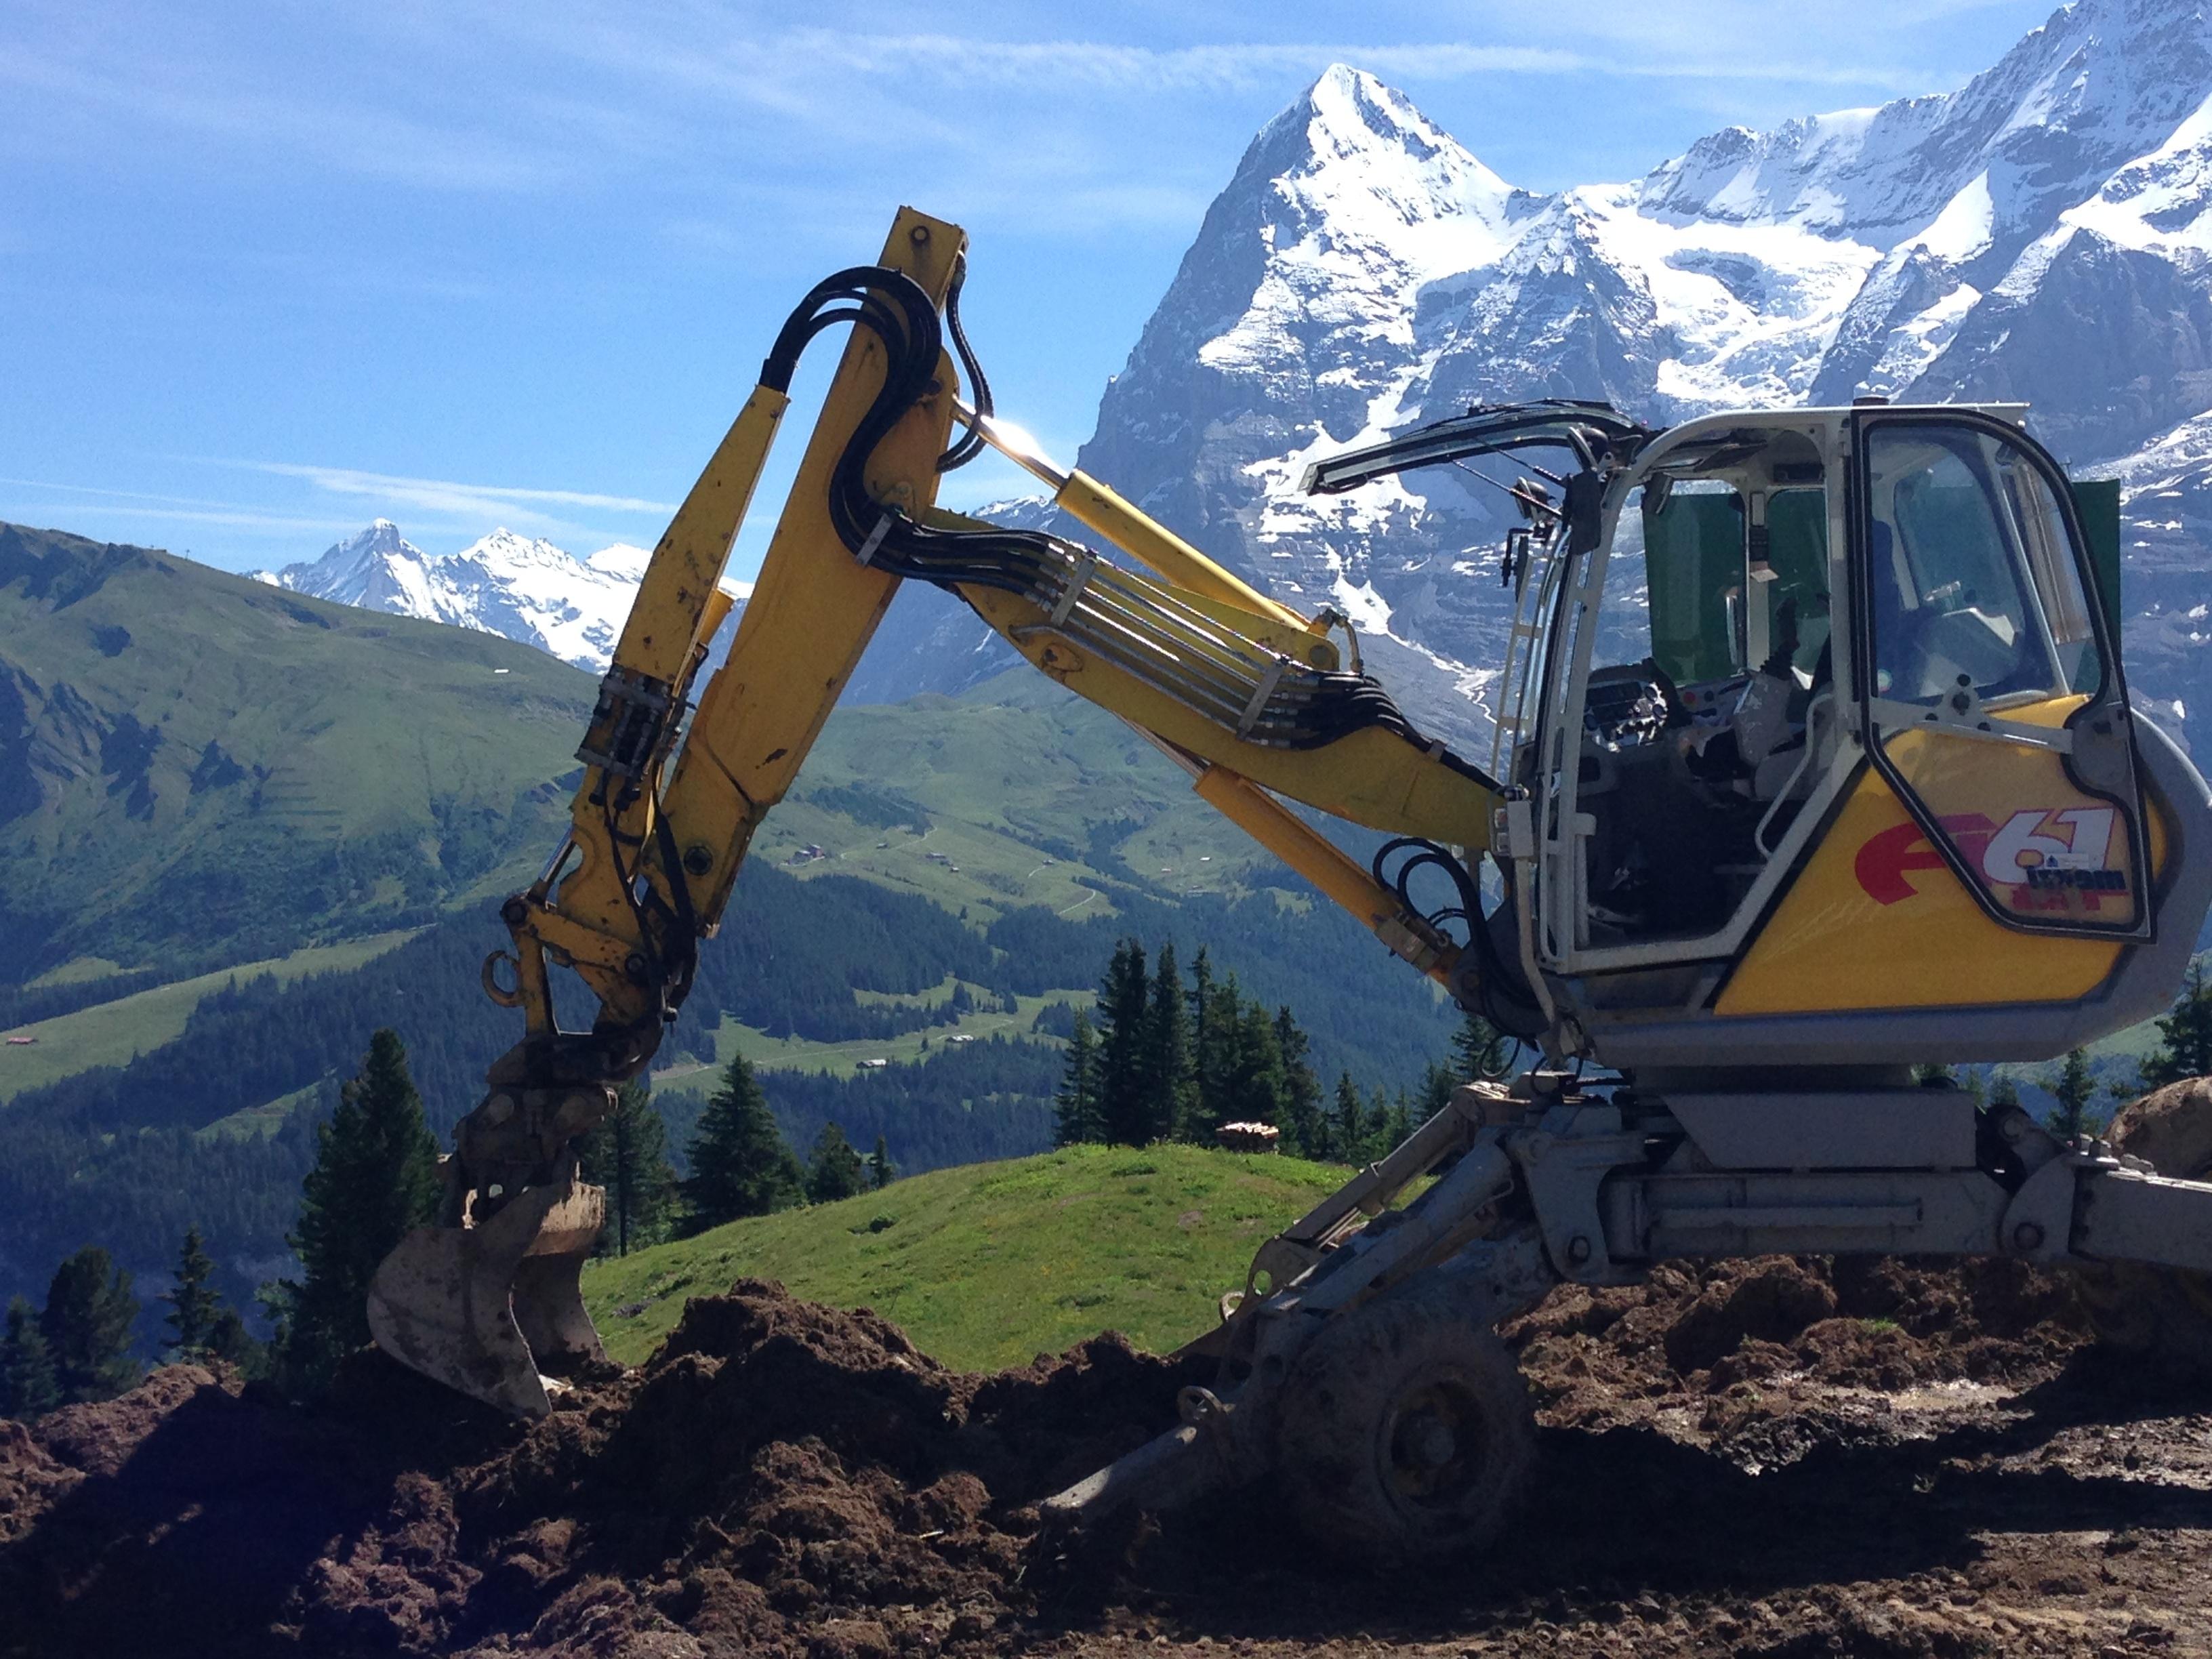 Kostenlose Foto Berg Bau Fahrzeug Ausrustung Boden Maschine